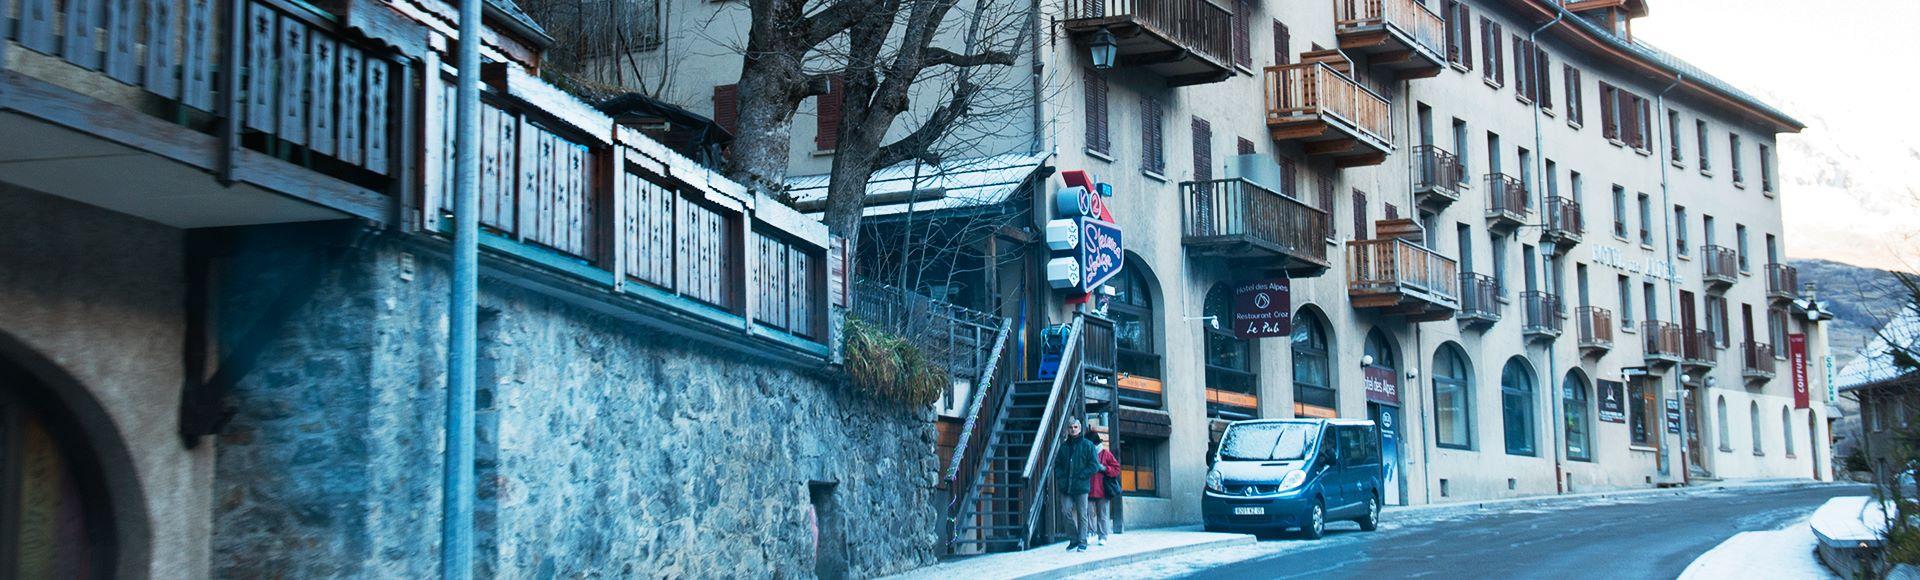 Skiers Lodge - Hotell I La Grave